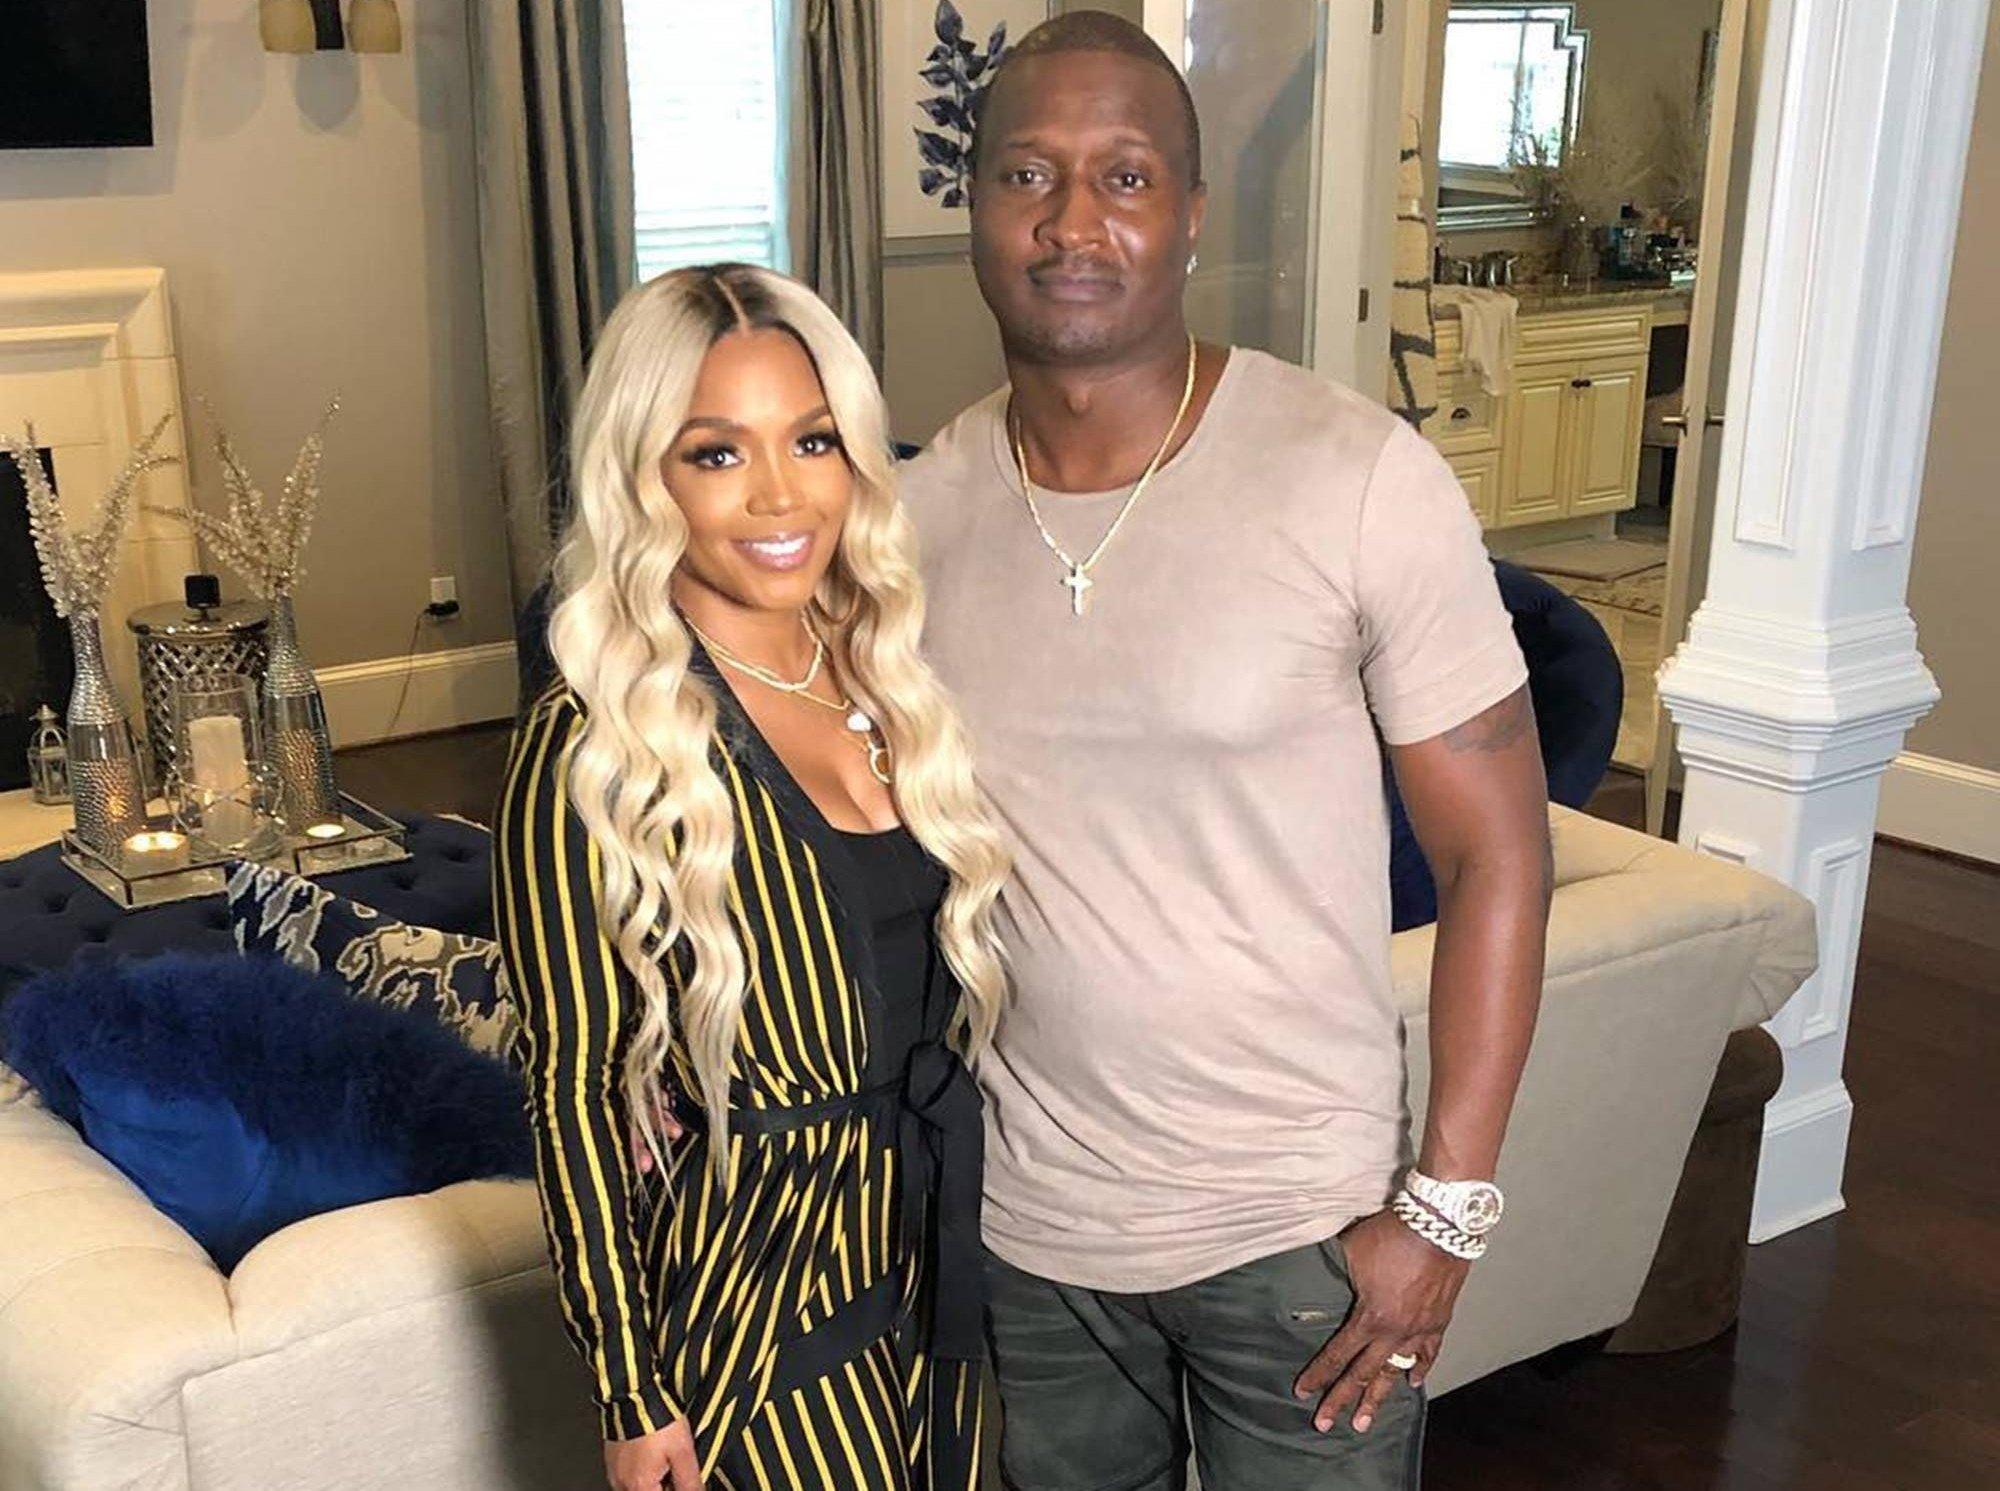 Rasheeda Frost Shows Off Her Summer Platinum Bob – See Her Favorite Hairdo